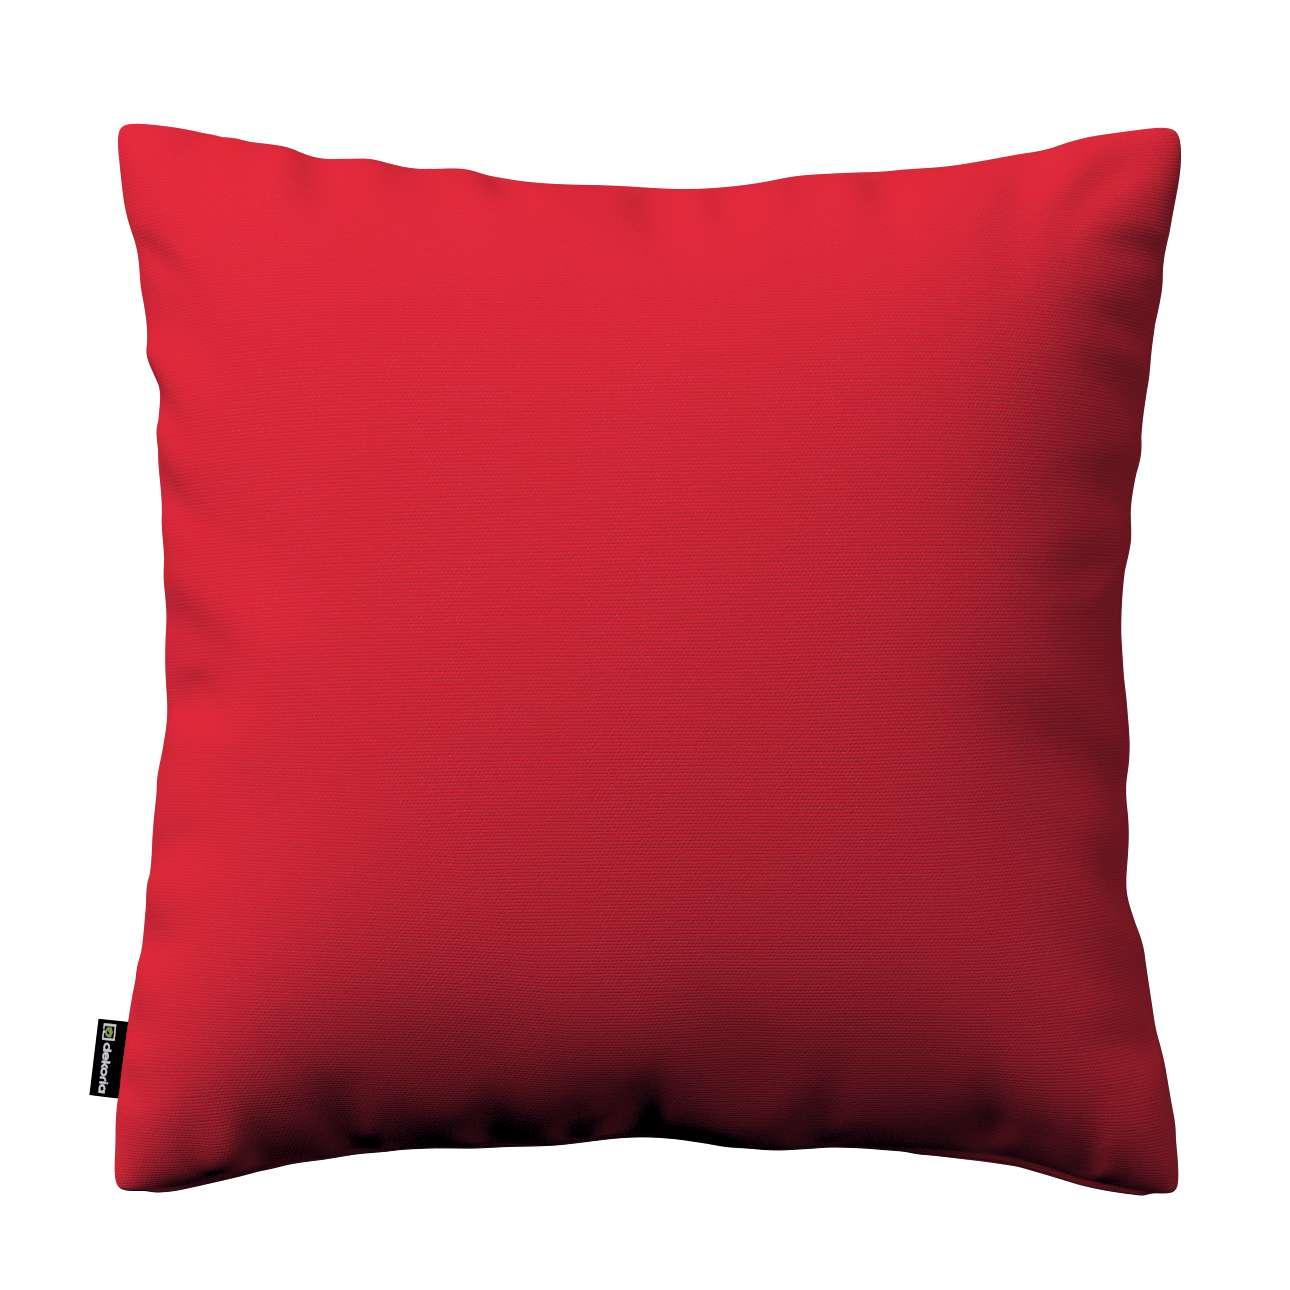 Kinga cushion cover in collection Panama Cotton, fabric: 702-04